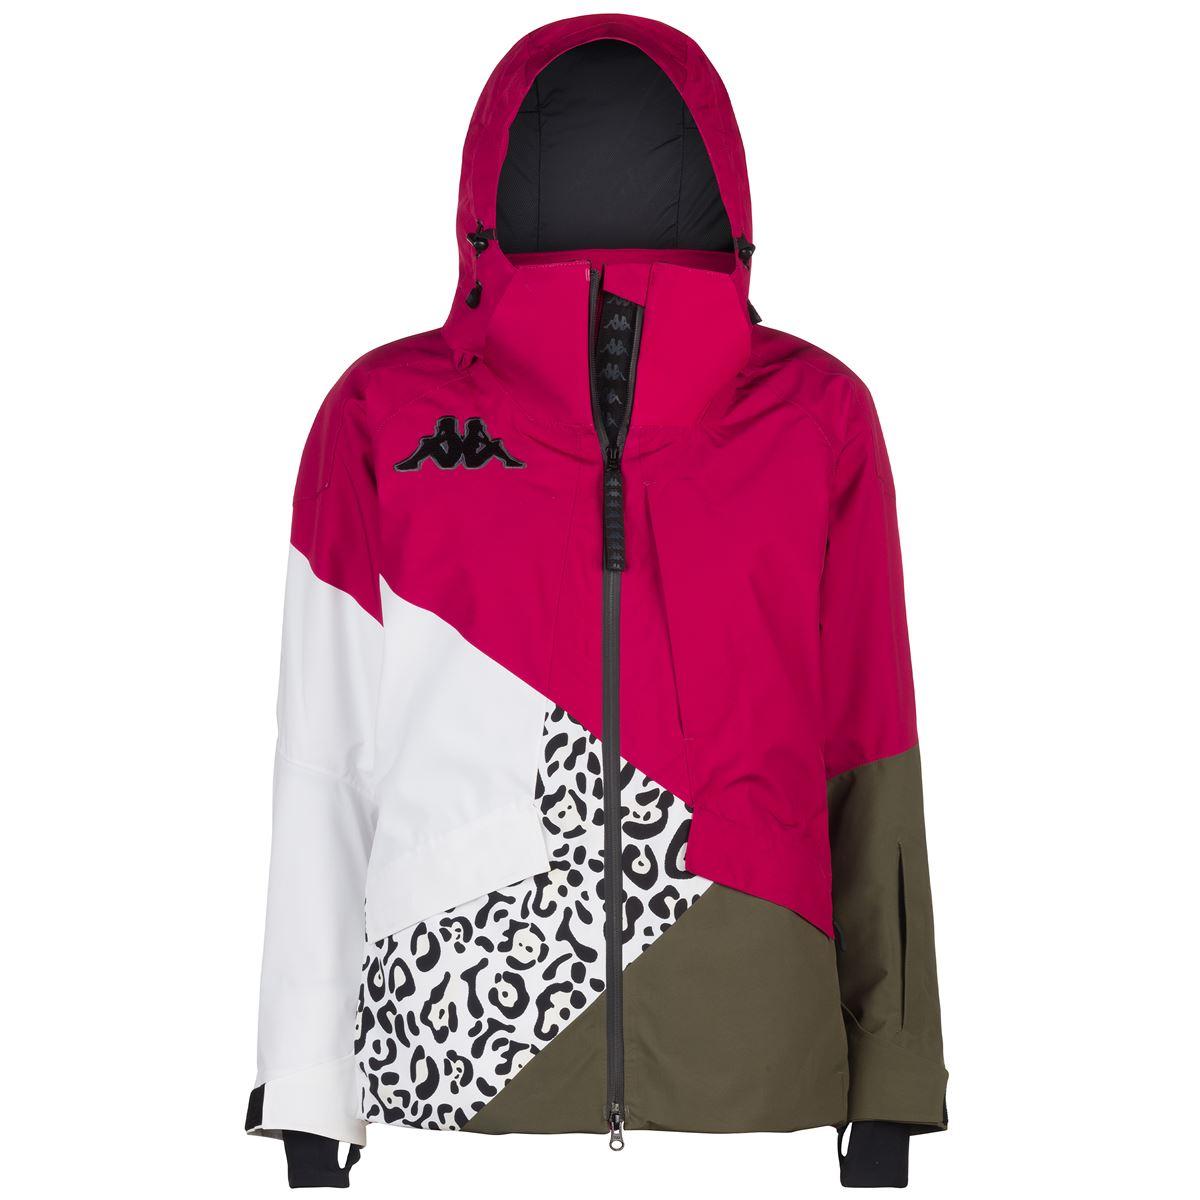 Kappa 6cento 612 giacca Donna